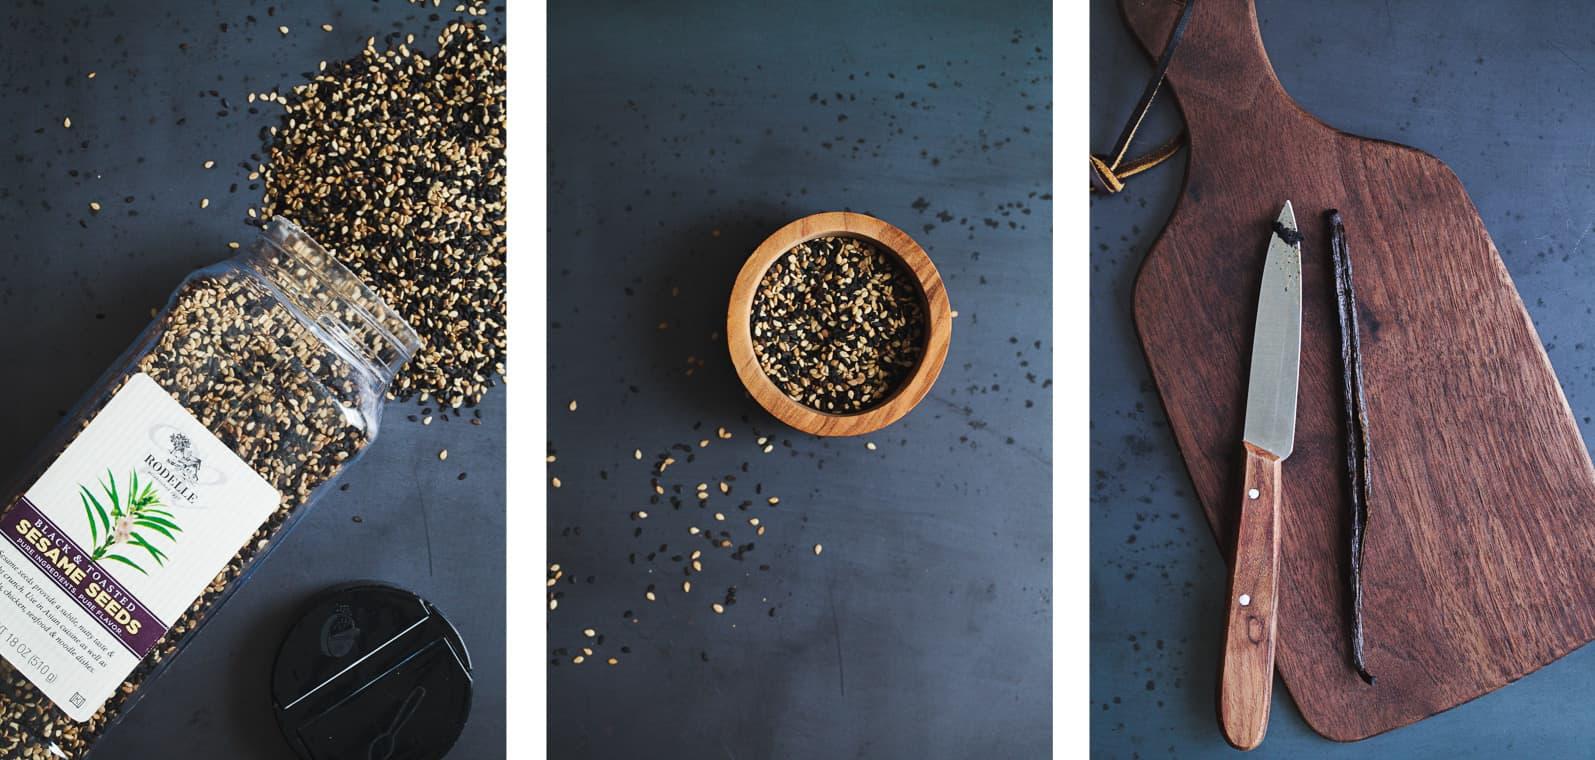 Rodelle Black Sesame Seeds and Vanilla Bean